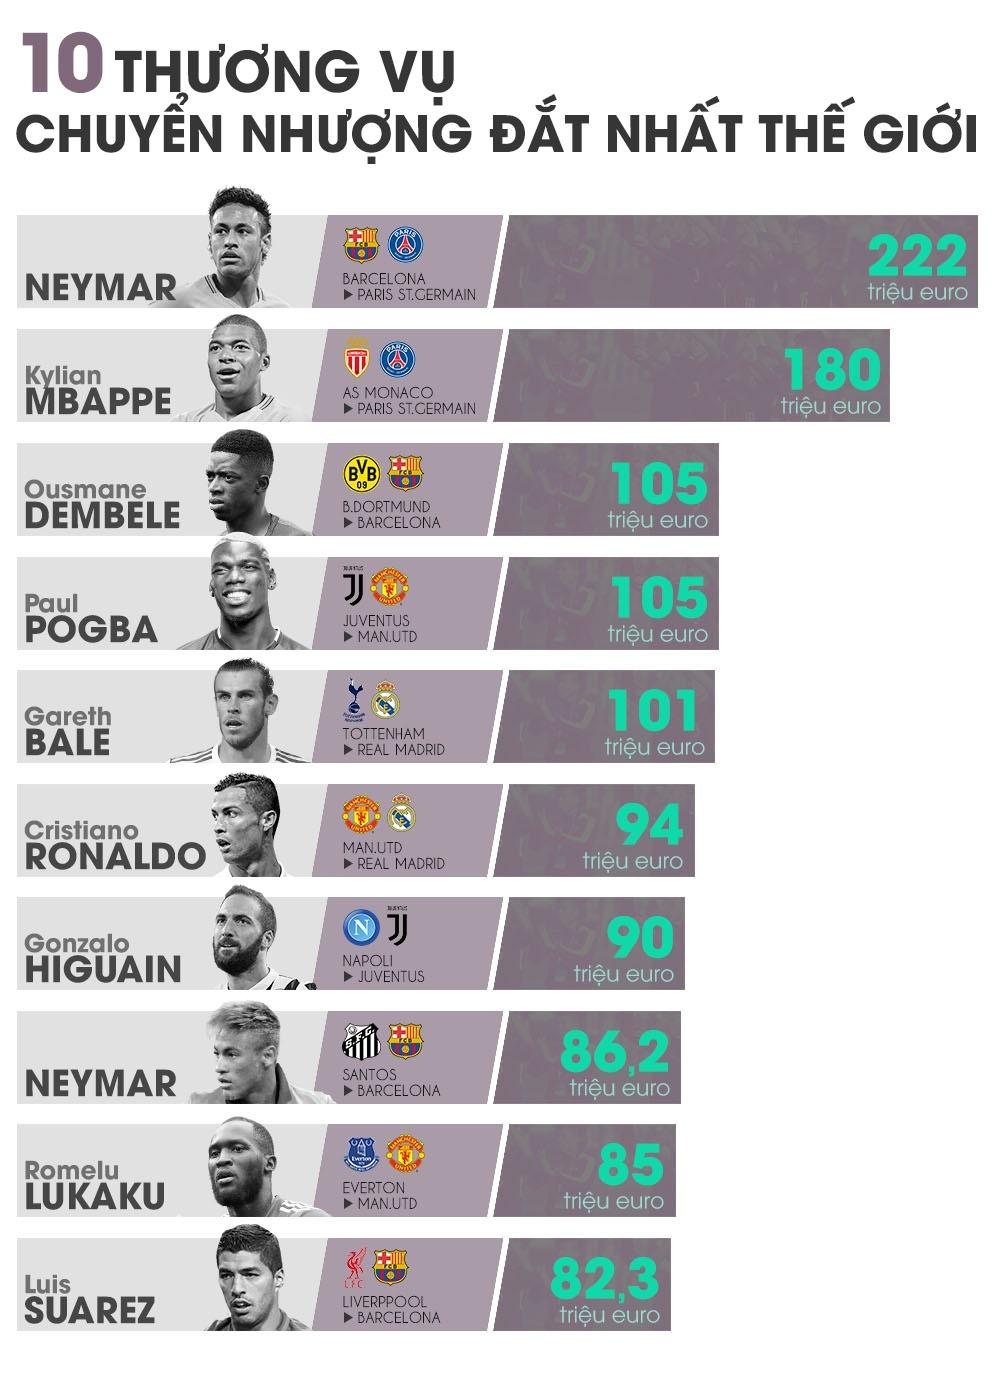 The thao the gioi 2017: Bom tan Neymar, CR7 va tran boxing bac ty hinh anh 8